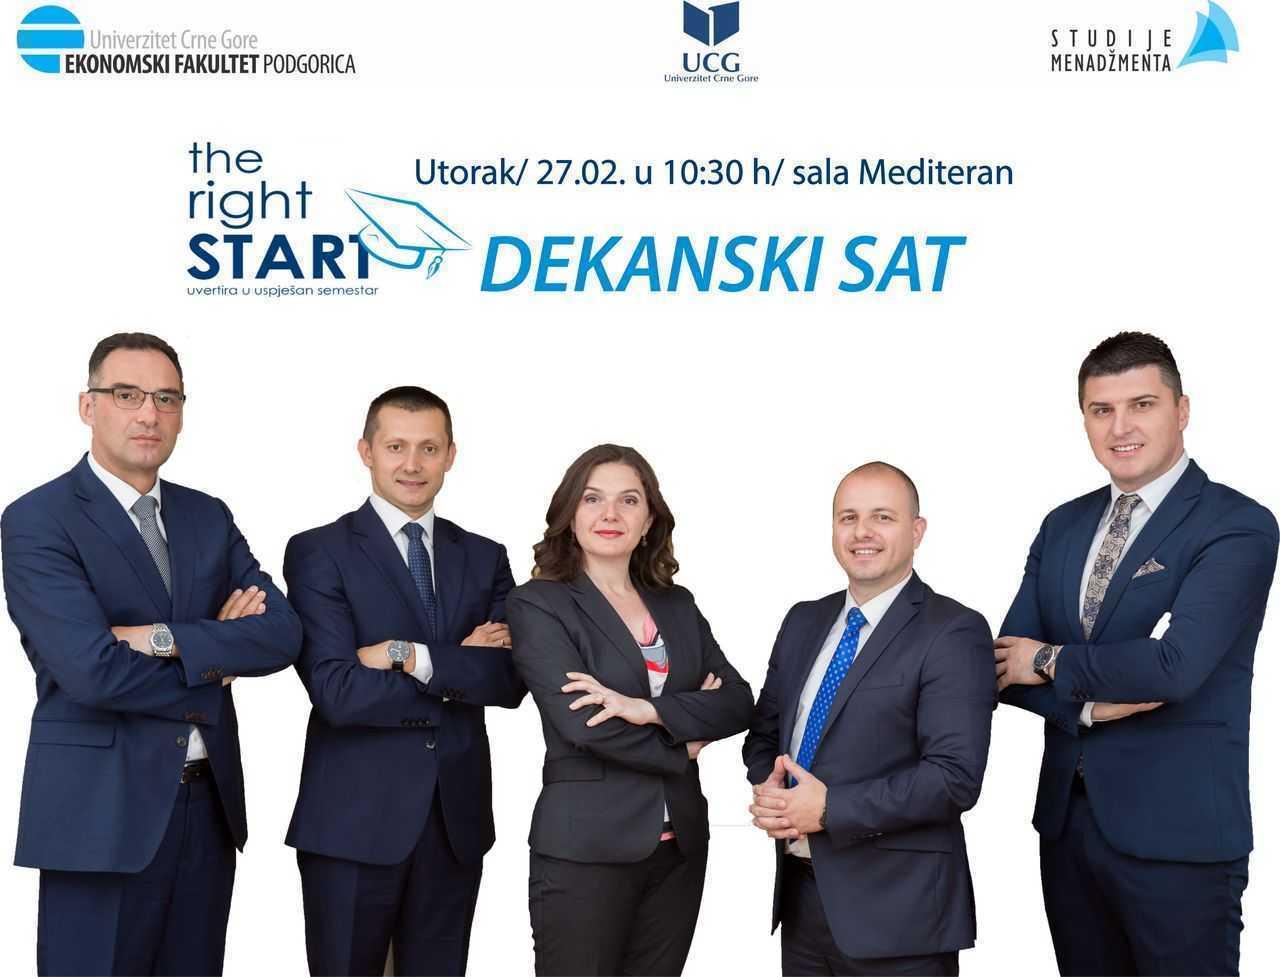 The Right Start : Dekanski sat